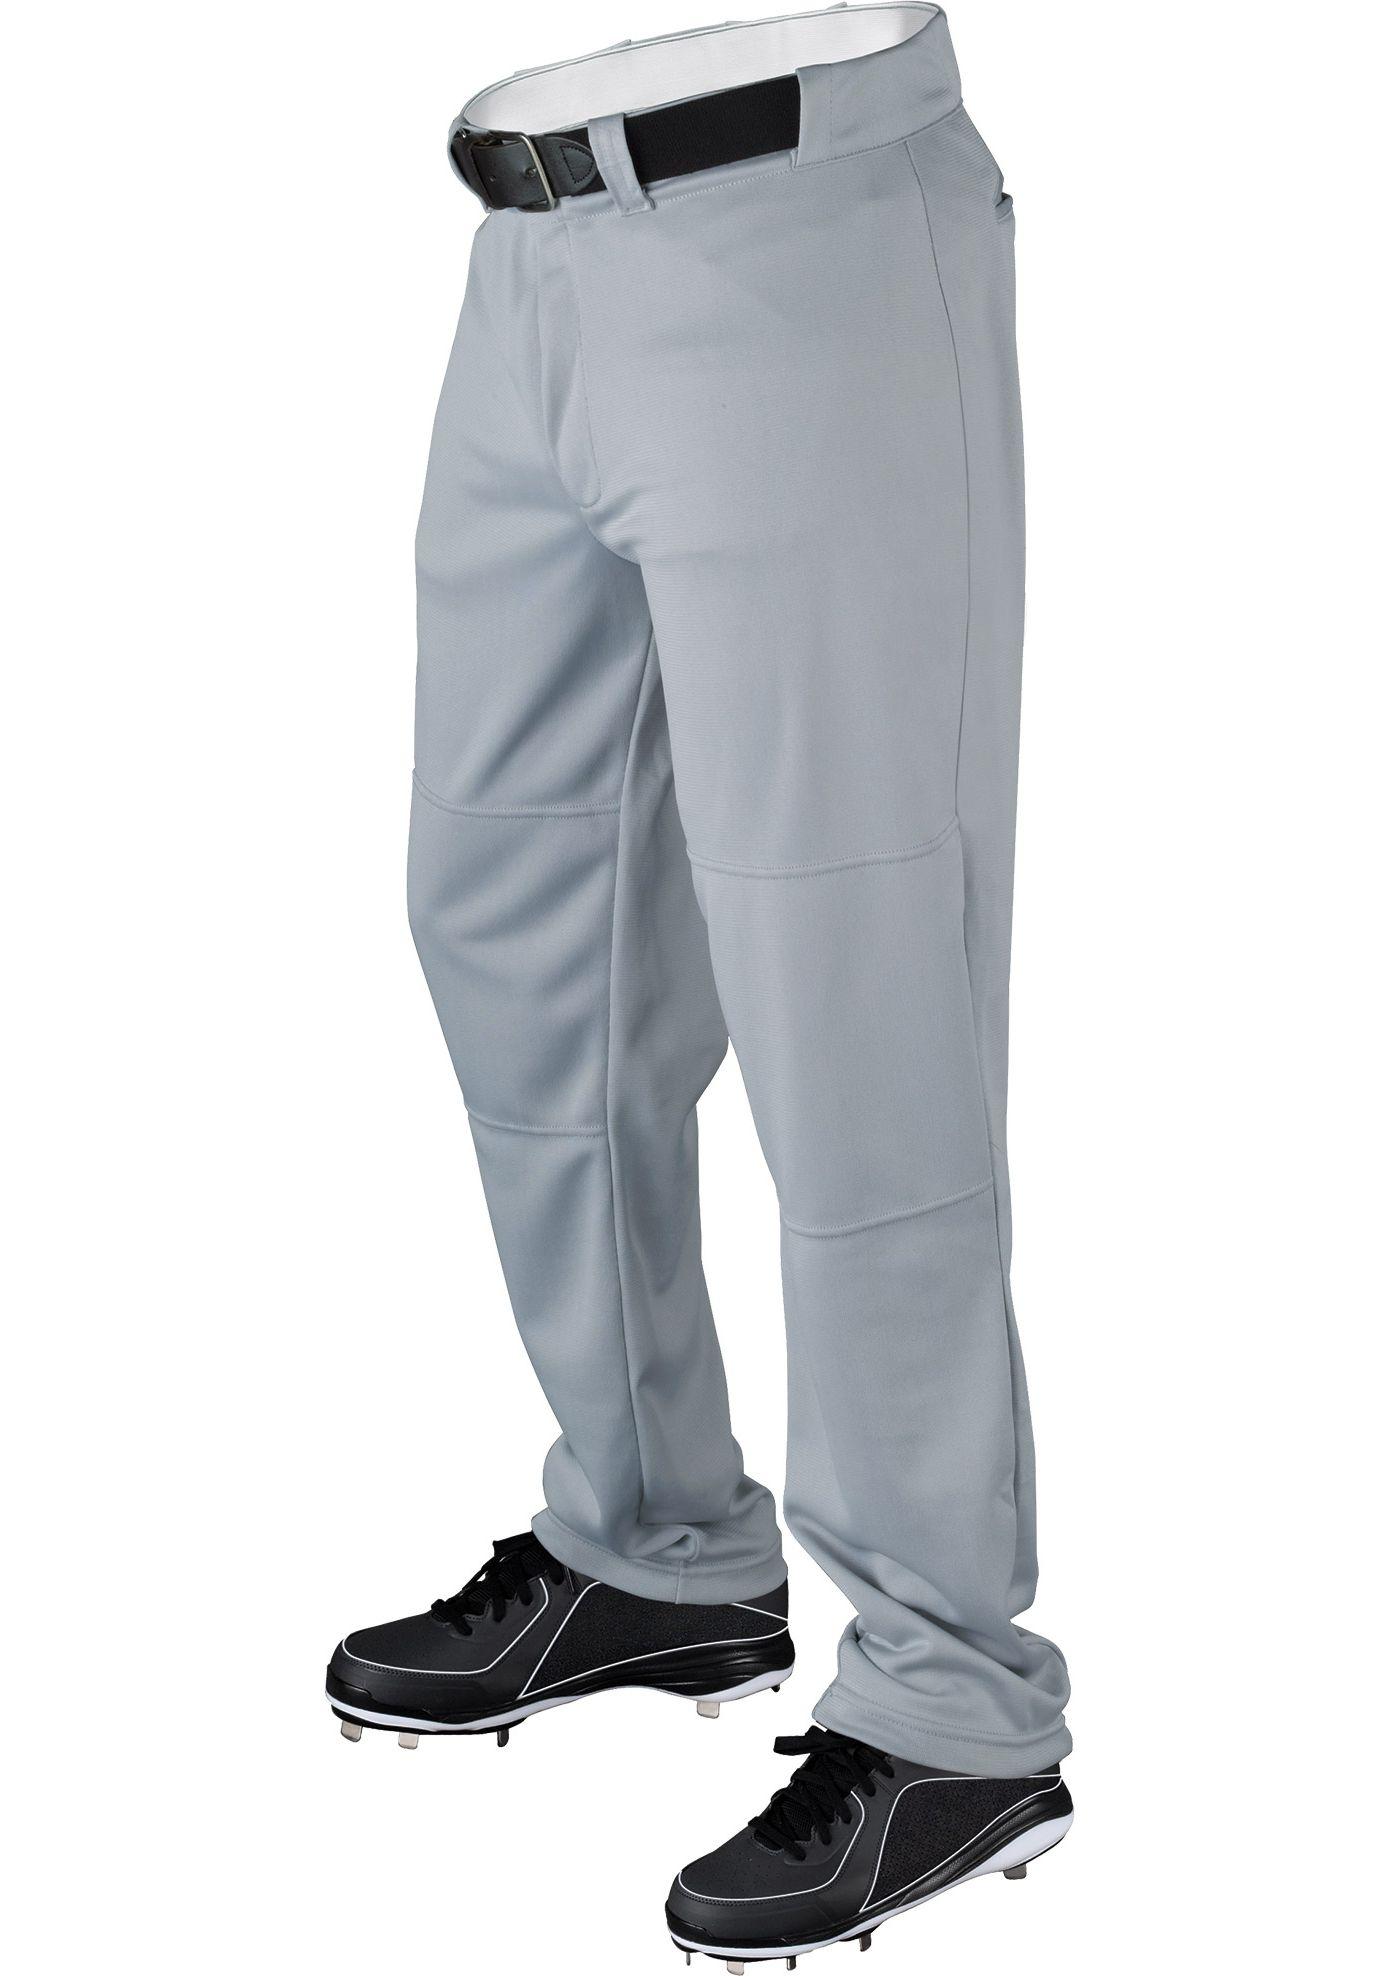 Wilson Boys' Relaxed Fit Baseball Pants